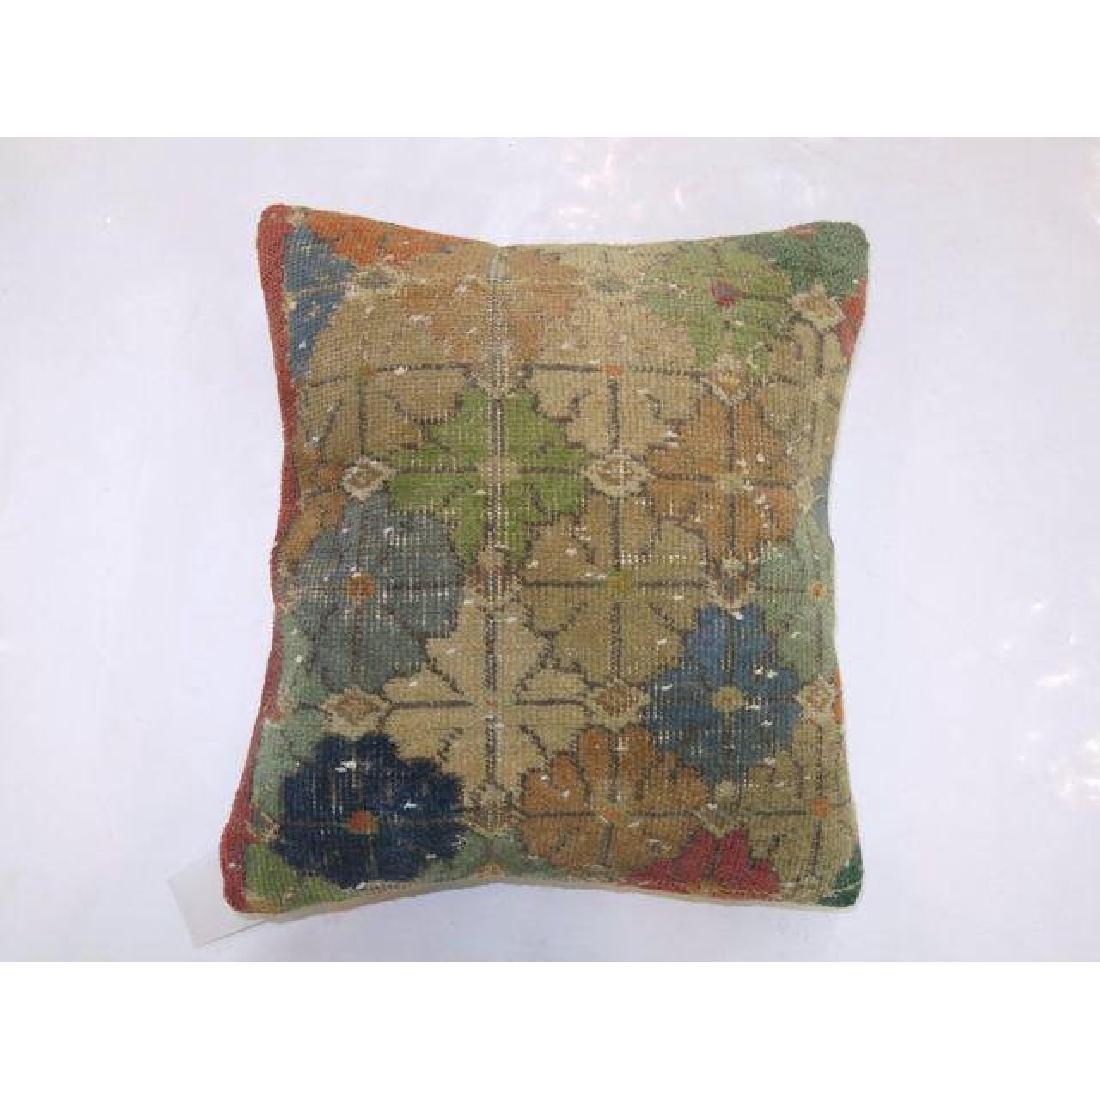 Turkish Boho Chic Deco Rug Pillow 1.8x1.6 - 2